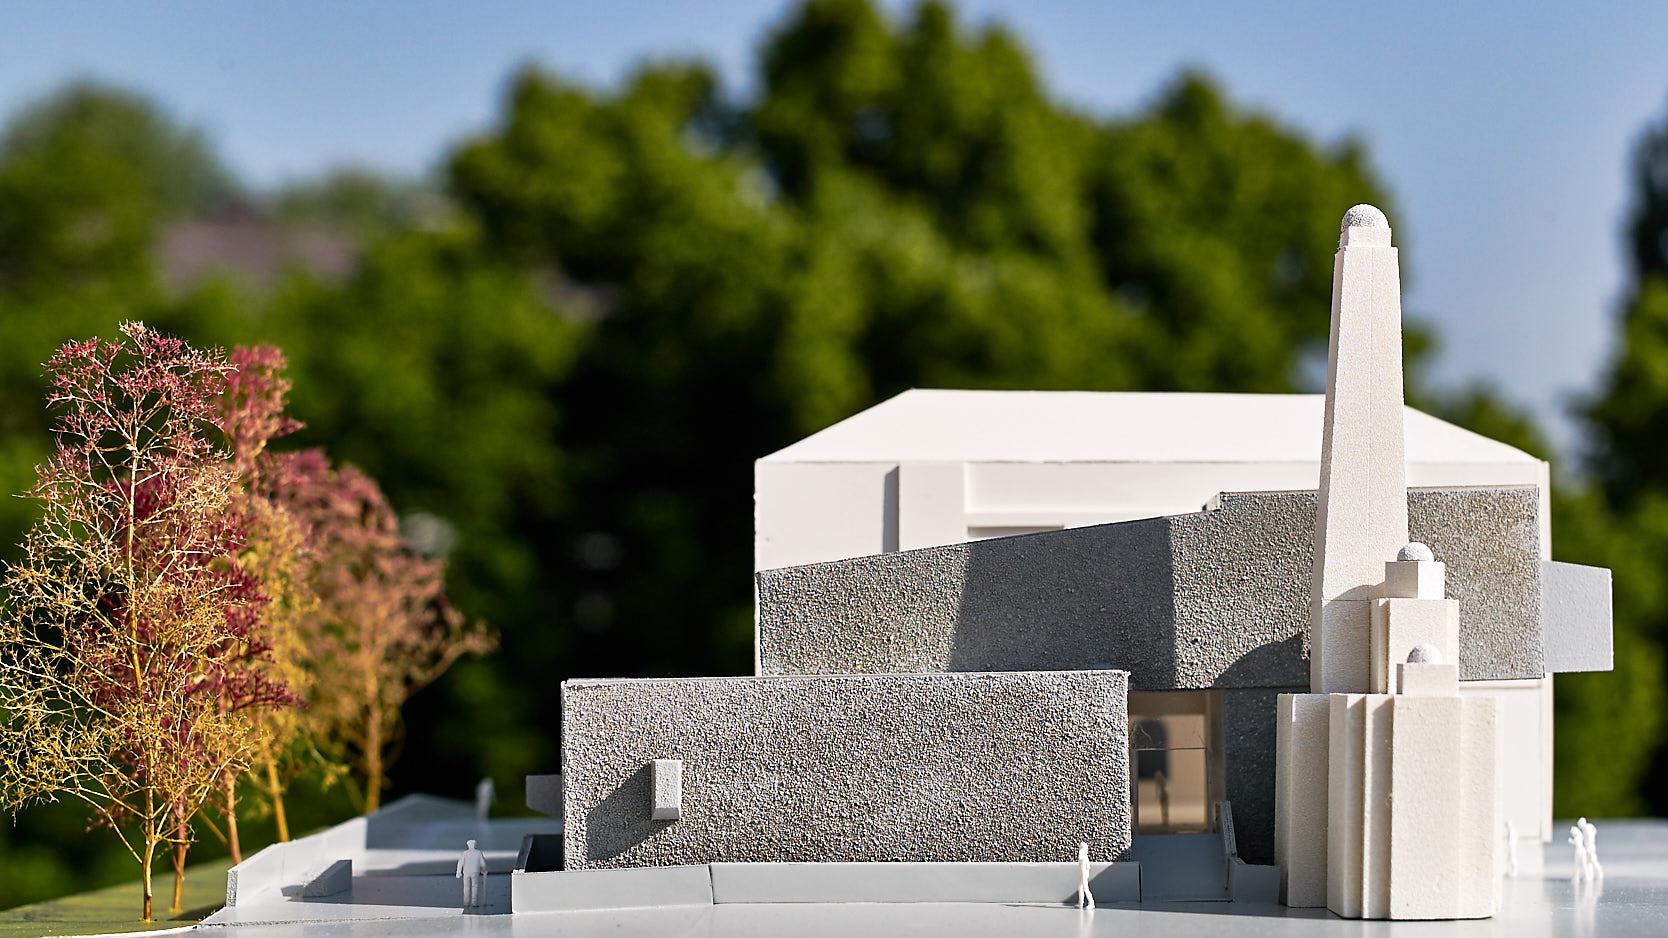 Zentralfriedhof: South/East